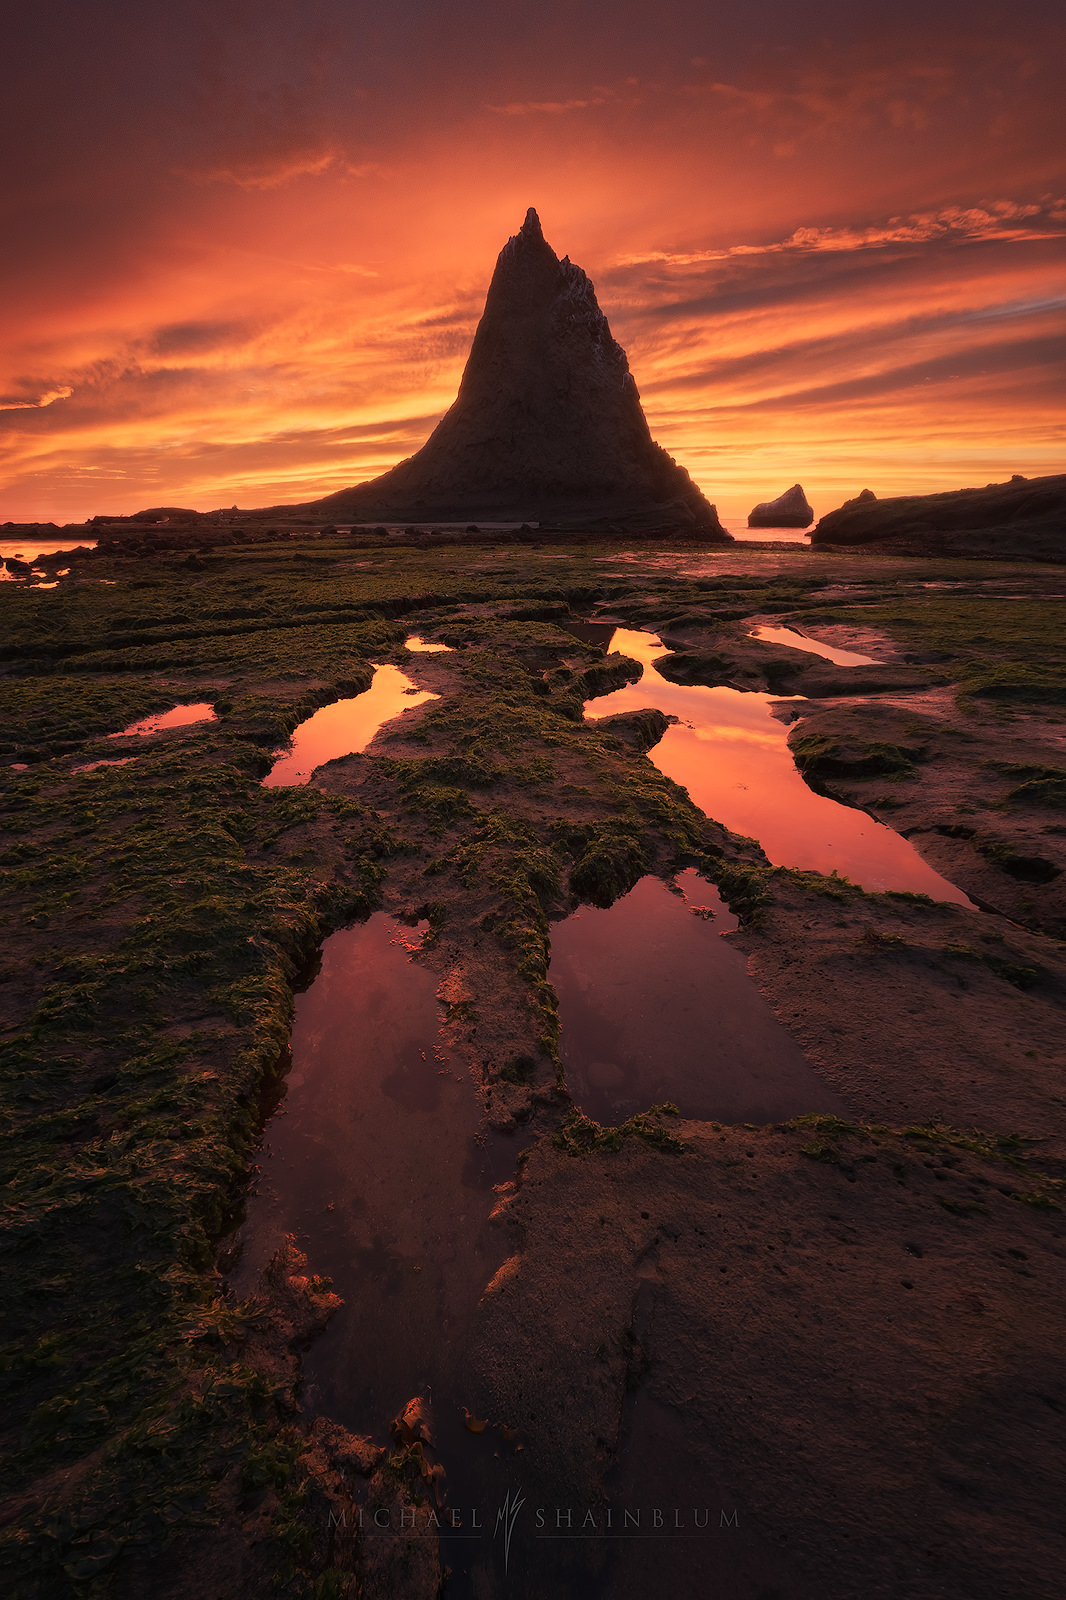 Half Moon Bay Seascape, Coastal Landscape Photography.